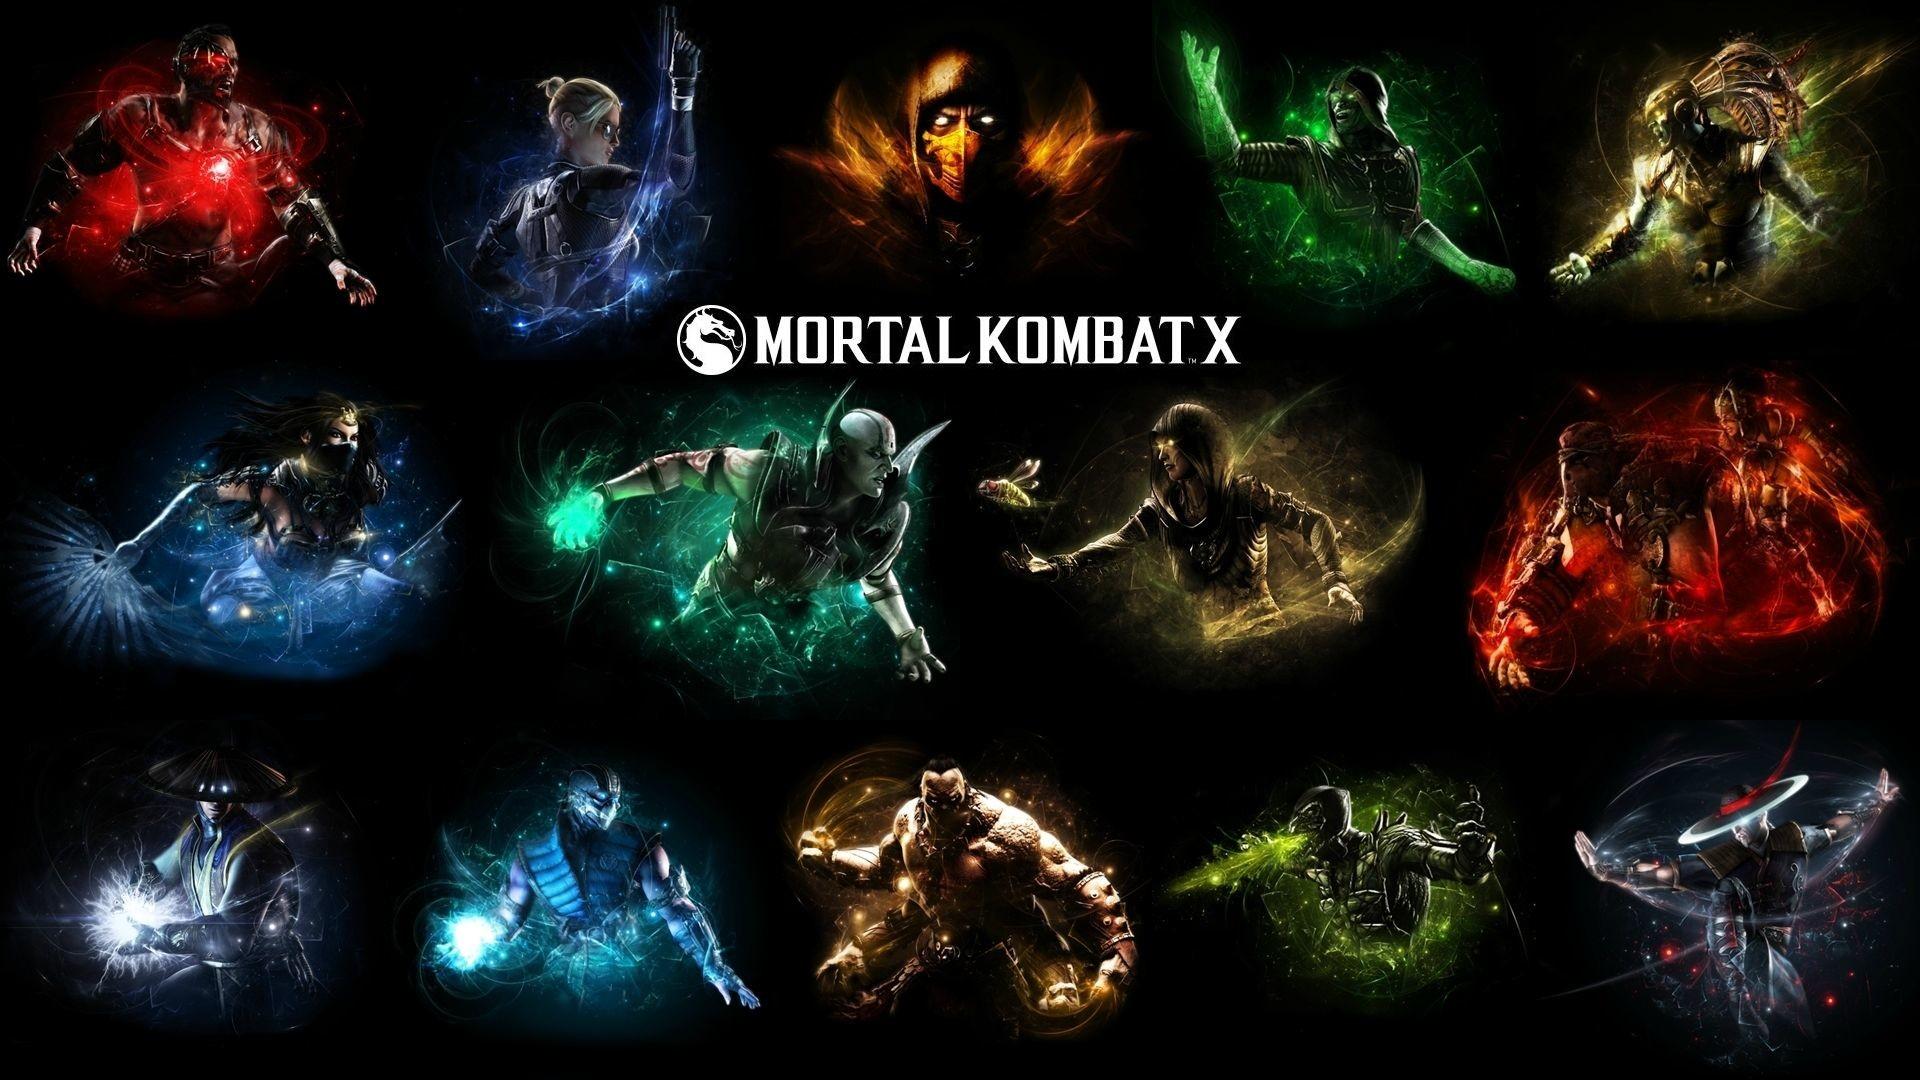 RMD:35 HD Mortal Kombat Wallpapers